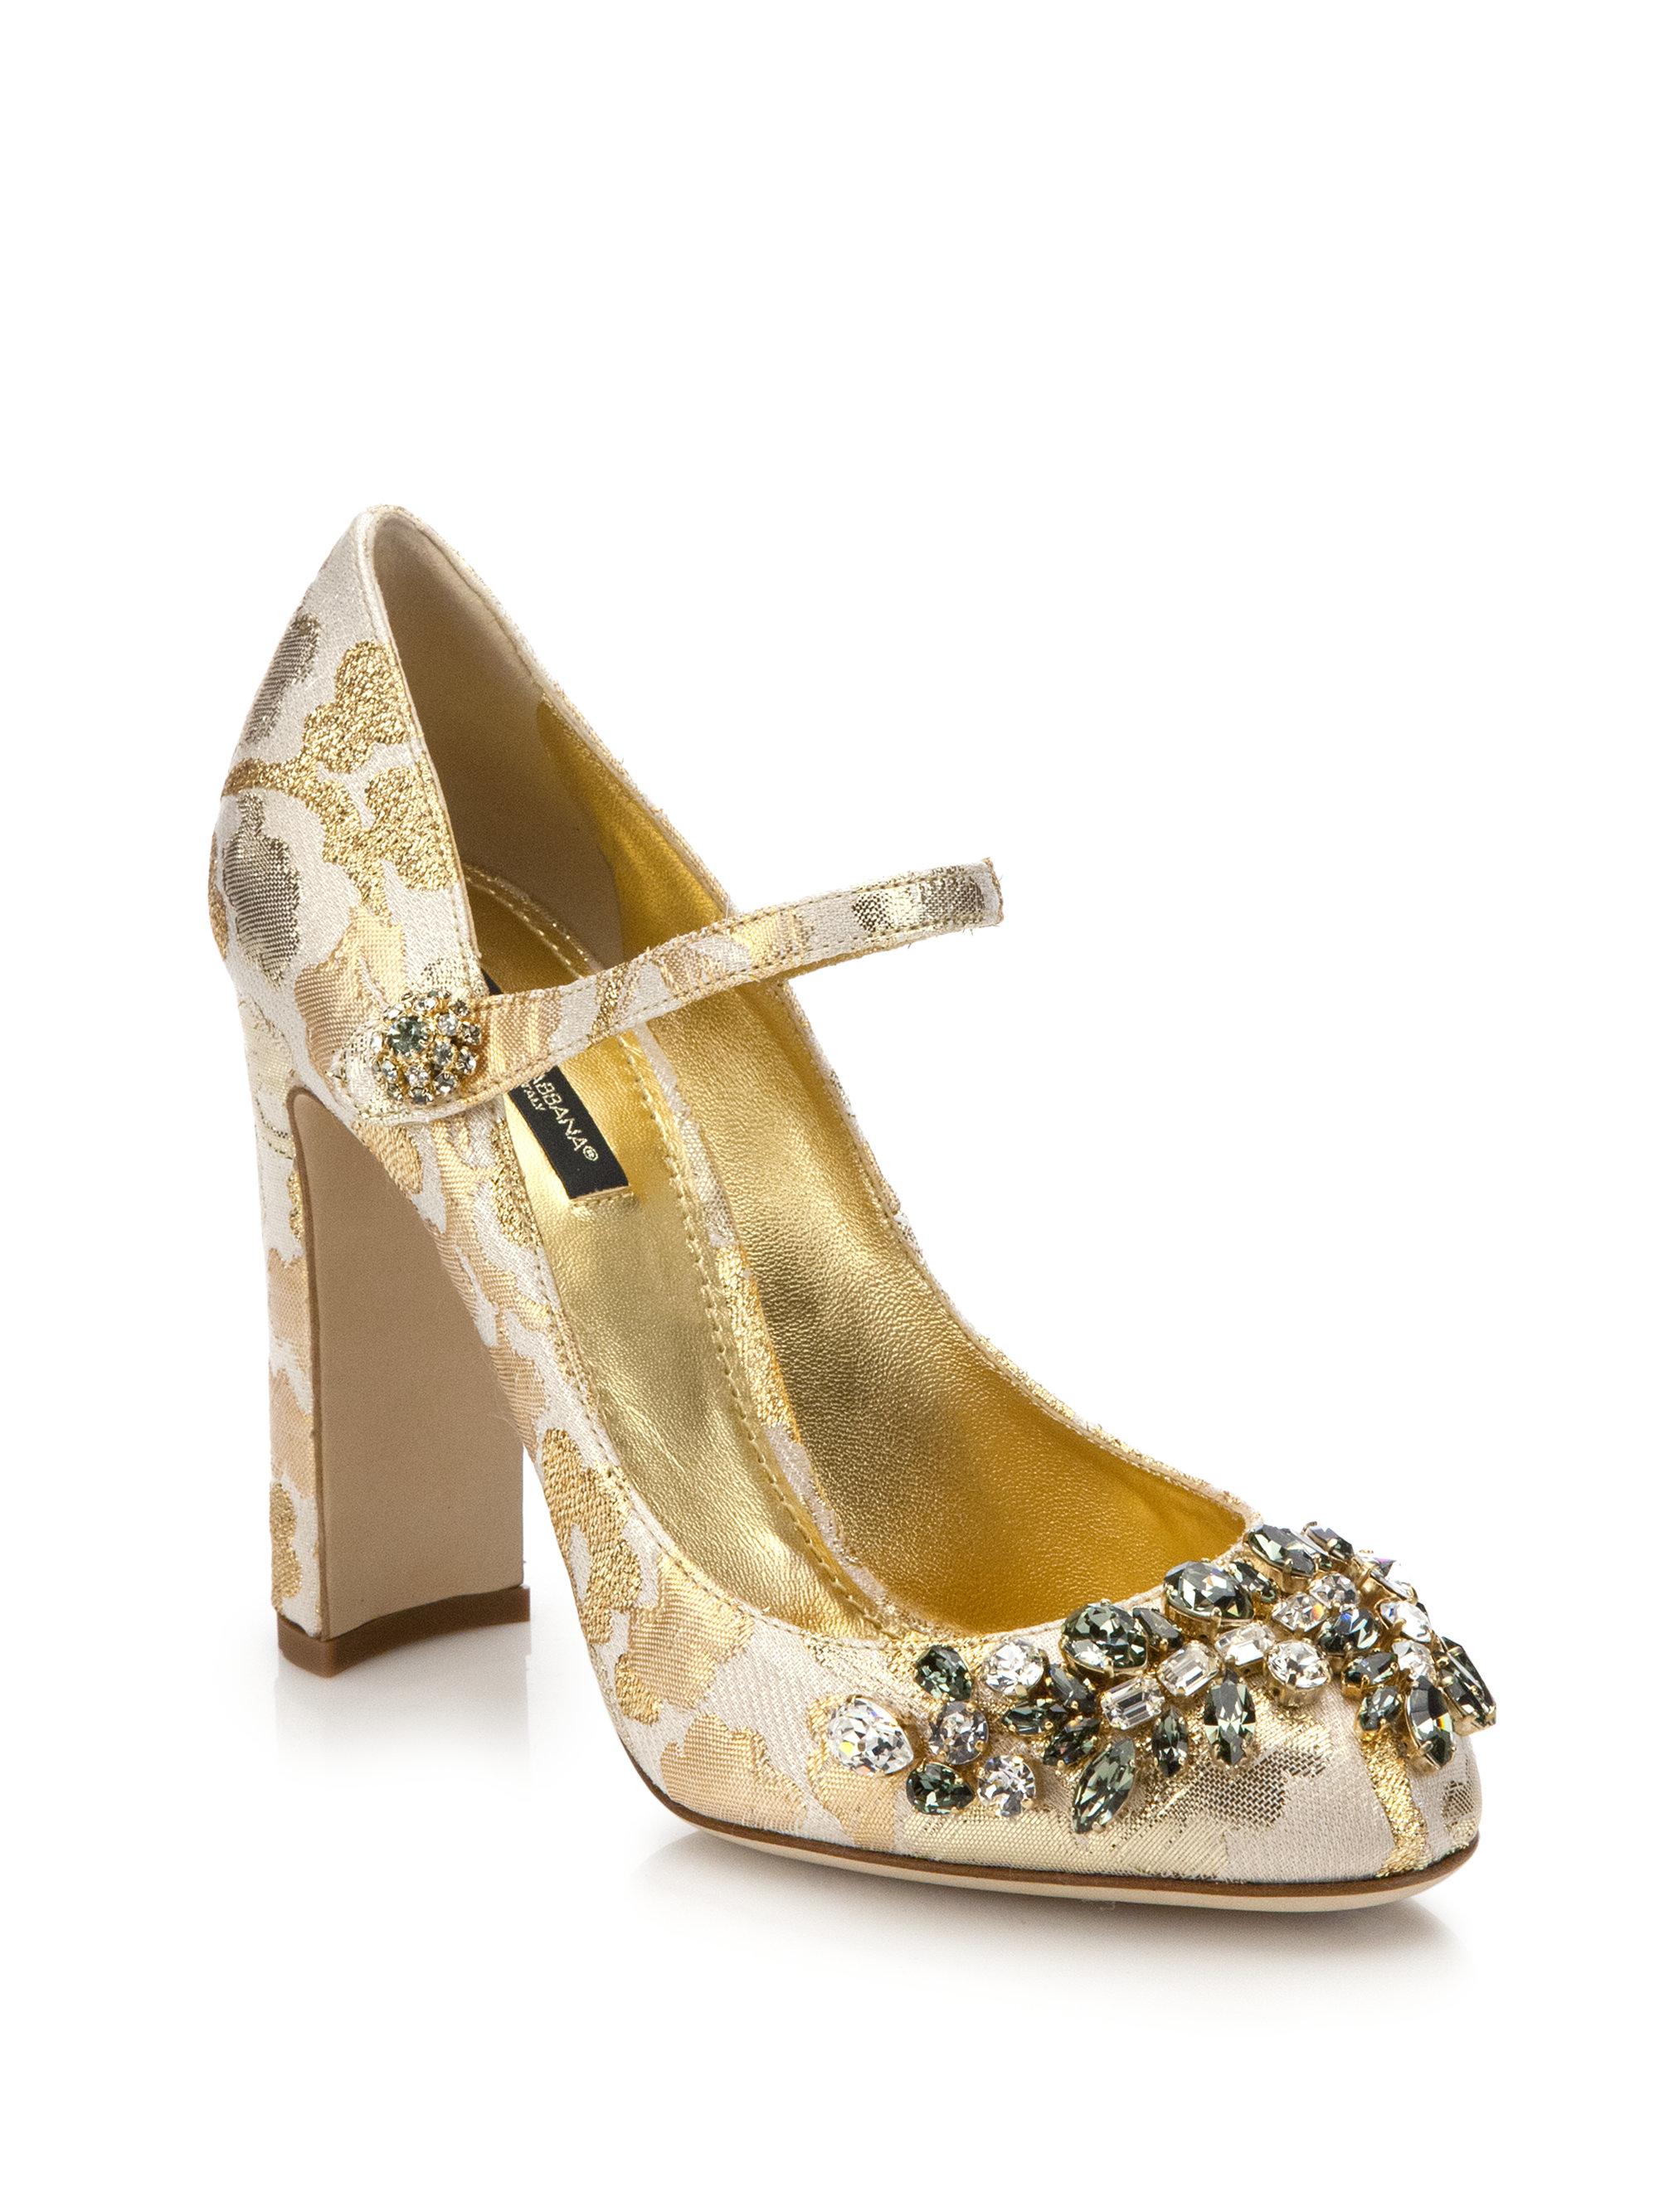 2776ae7af1c Lyst - Dolce   Gabbana Embellished Brocade Mary Jane Pumps in Metallic